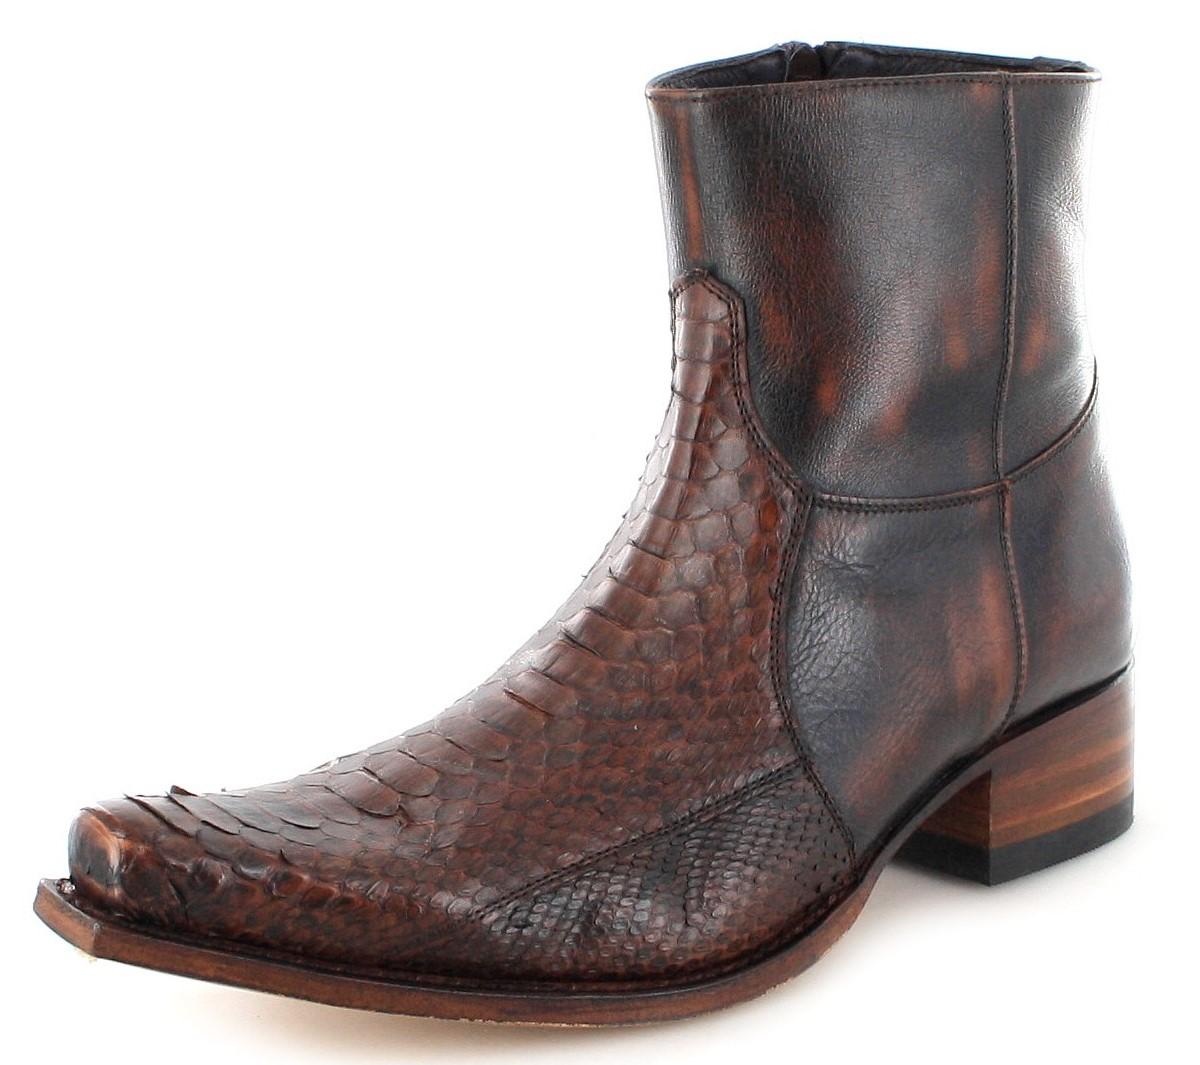 Sendra Boots 5701P Jacinto Fashion Exotic Stiefelette - dunkel braun